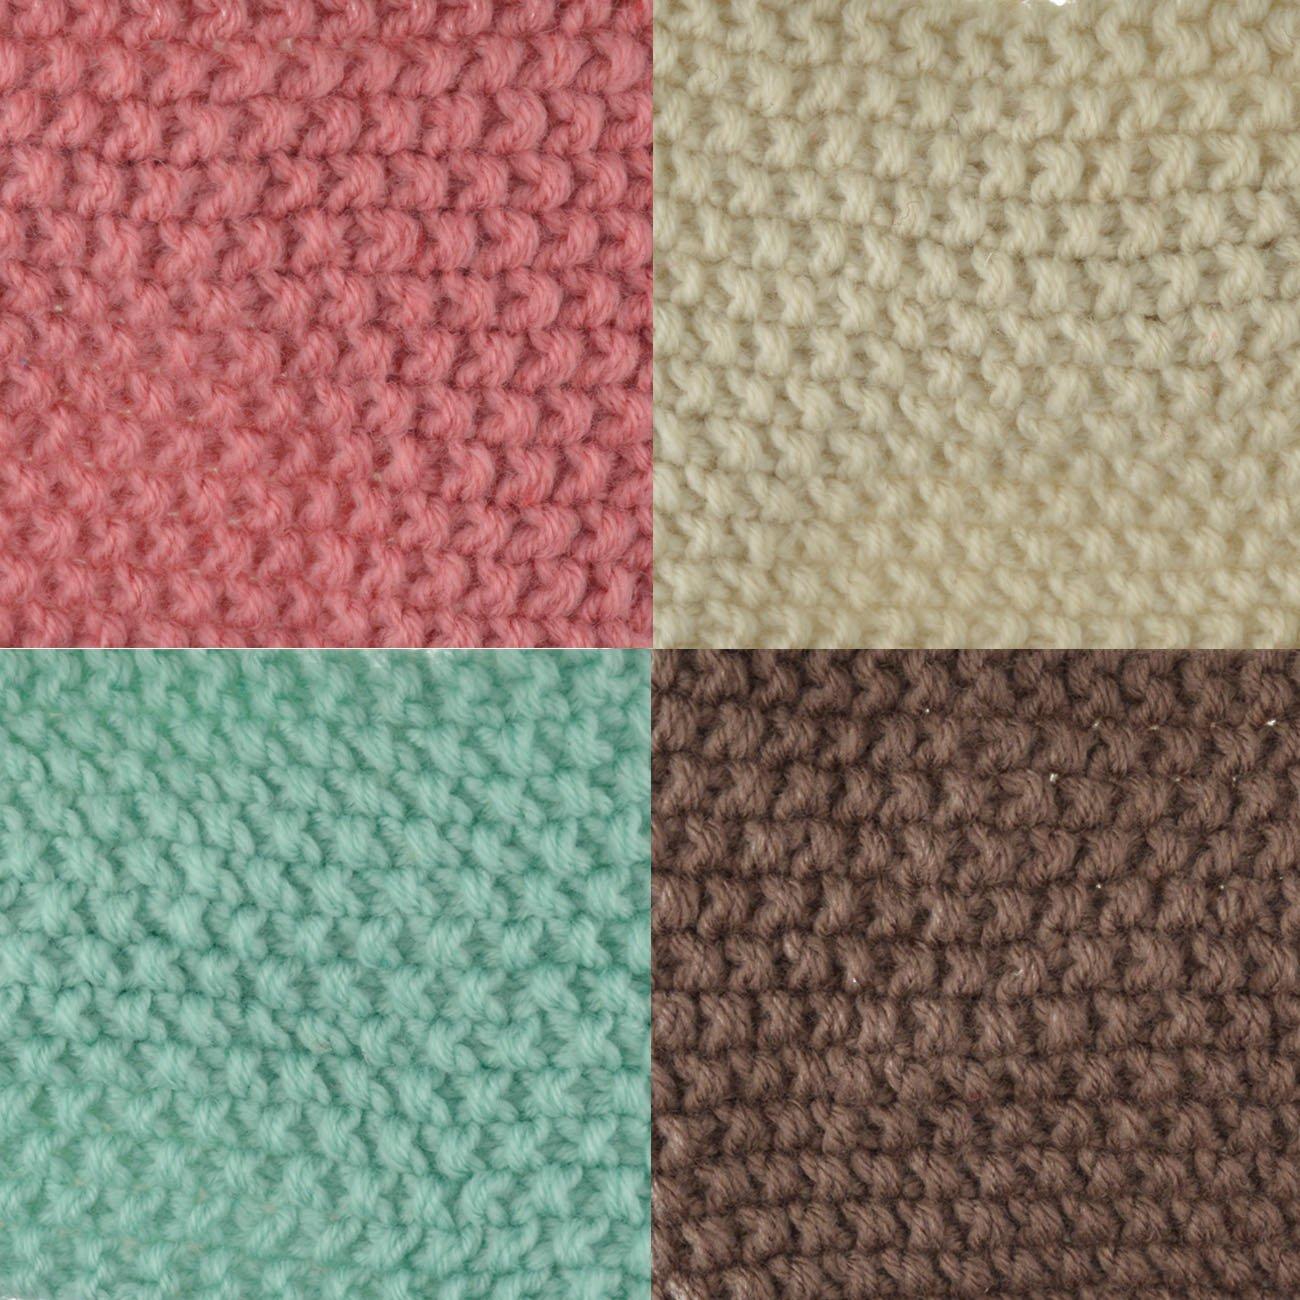 DRESHOW 4 Piezas Crochet Arco Turbante Knit Diadema Mujer Invierno Vendas  Elasticas Anchas Tejida Lana Cintas Para El Pelo Banda de pelo más cálido  ... 4e43265b8d6d